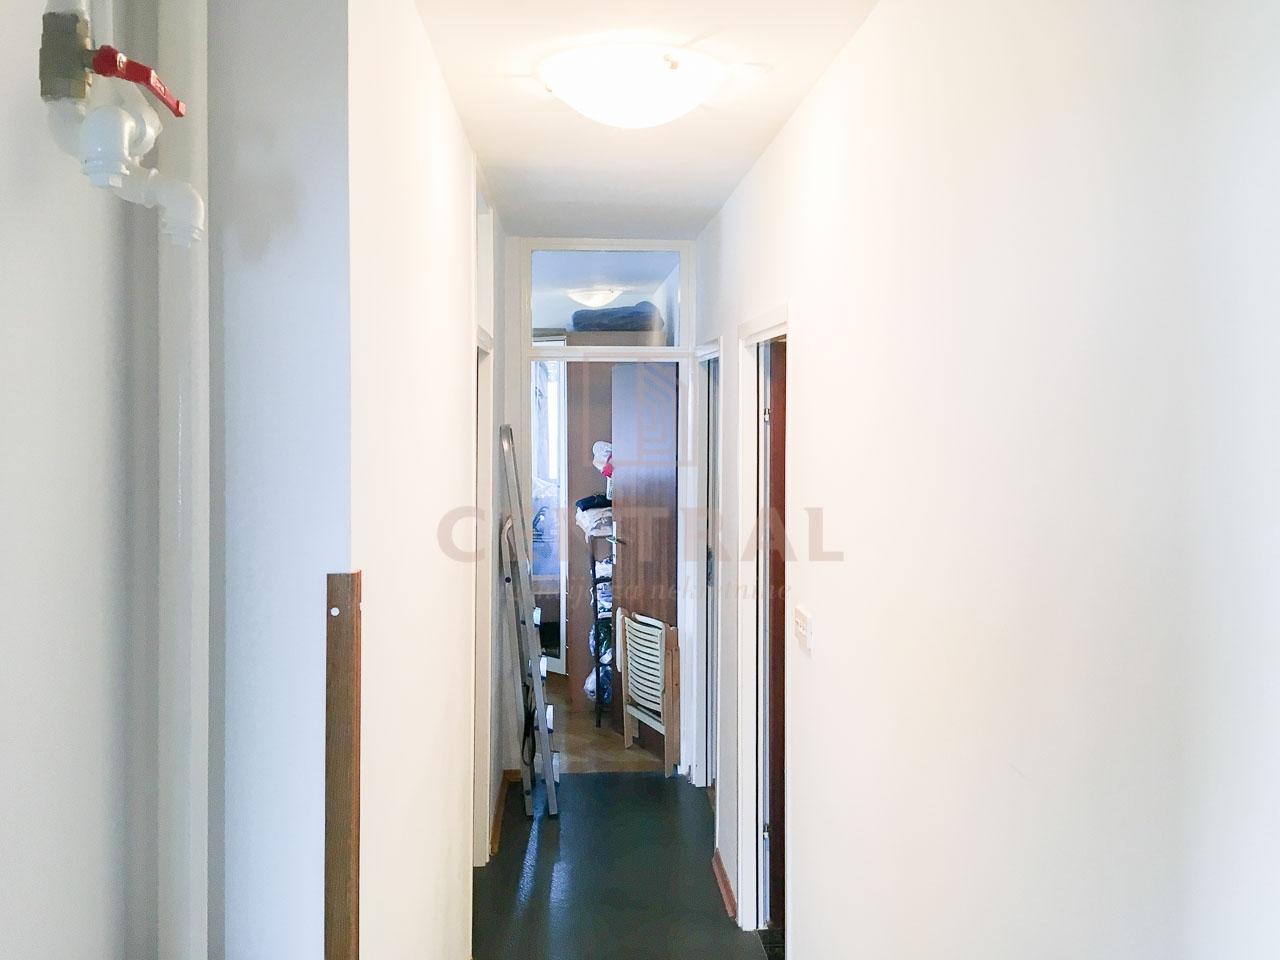 Krnjevo, trosobni stan s dnevnim boravkom, 81 m2